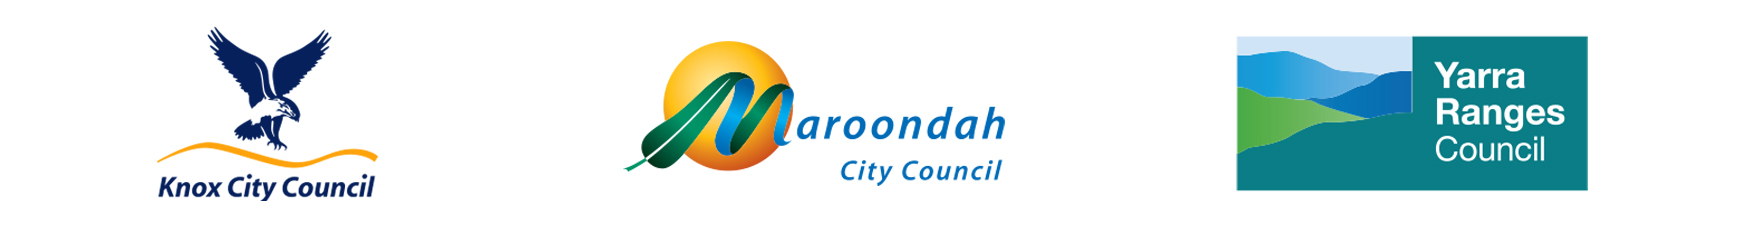 Knox City Council, Maroondah City Council, Yarra Ranges Council